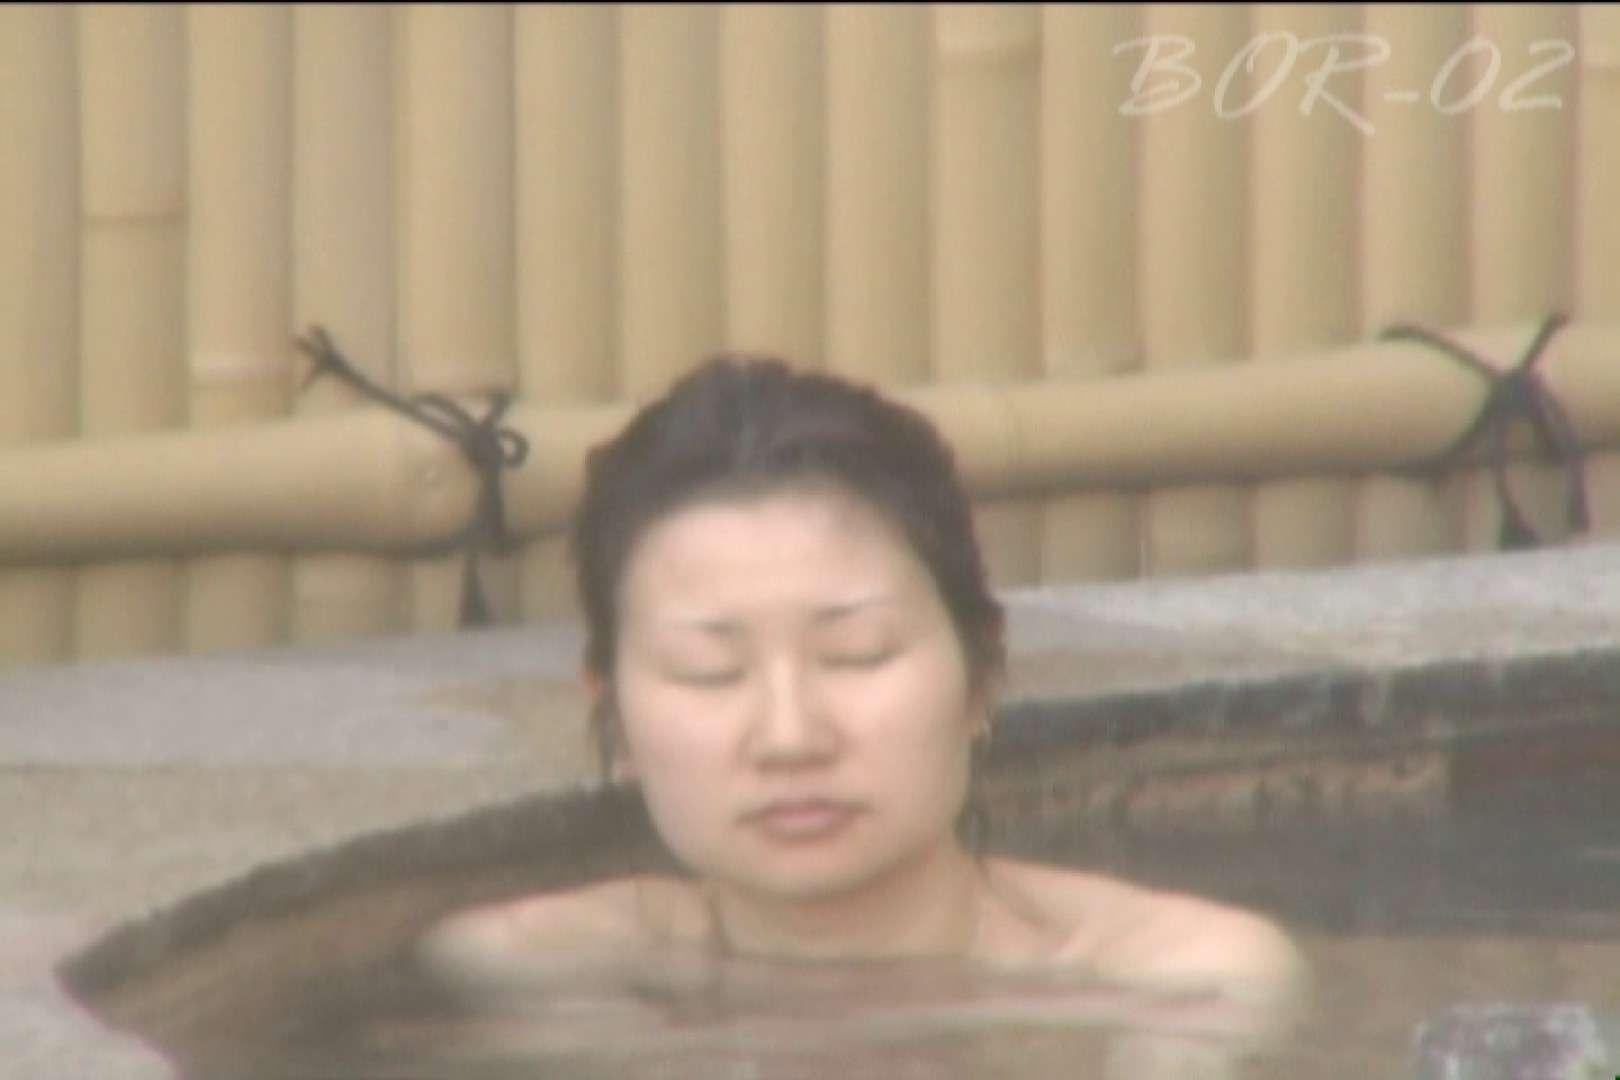 Aquaな露天風呂Vol.477 OLのプライベート   盗撮特撮  13pic 1